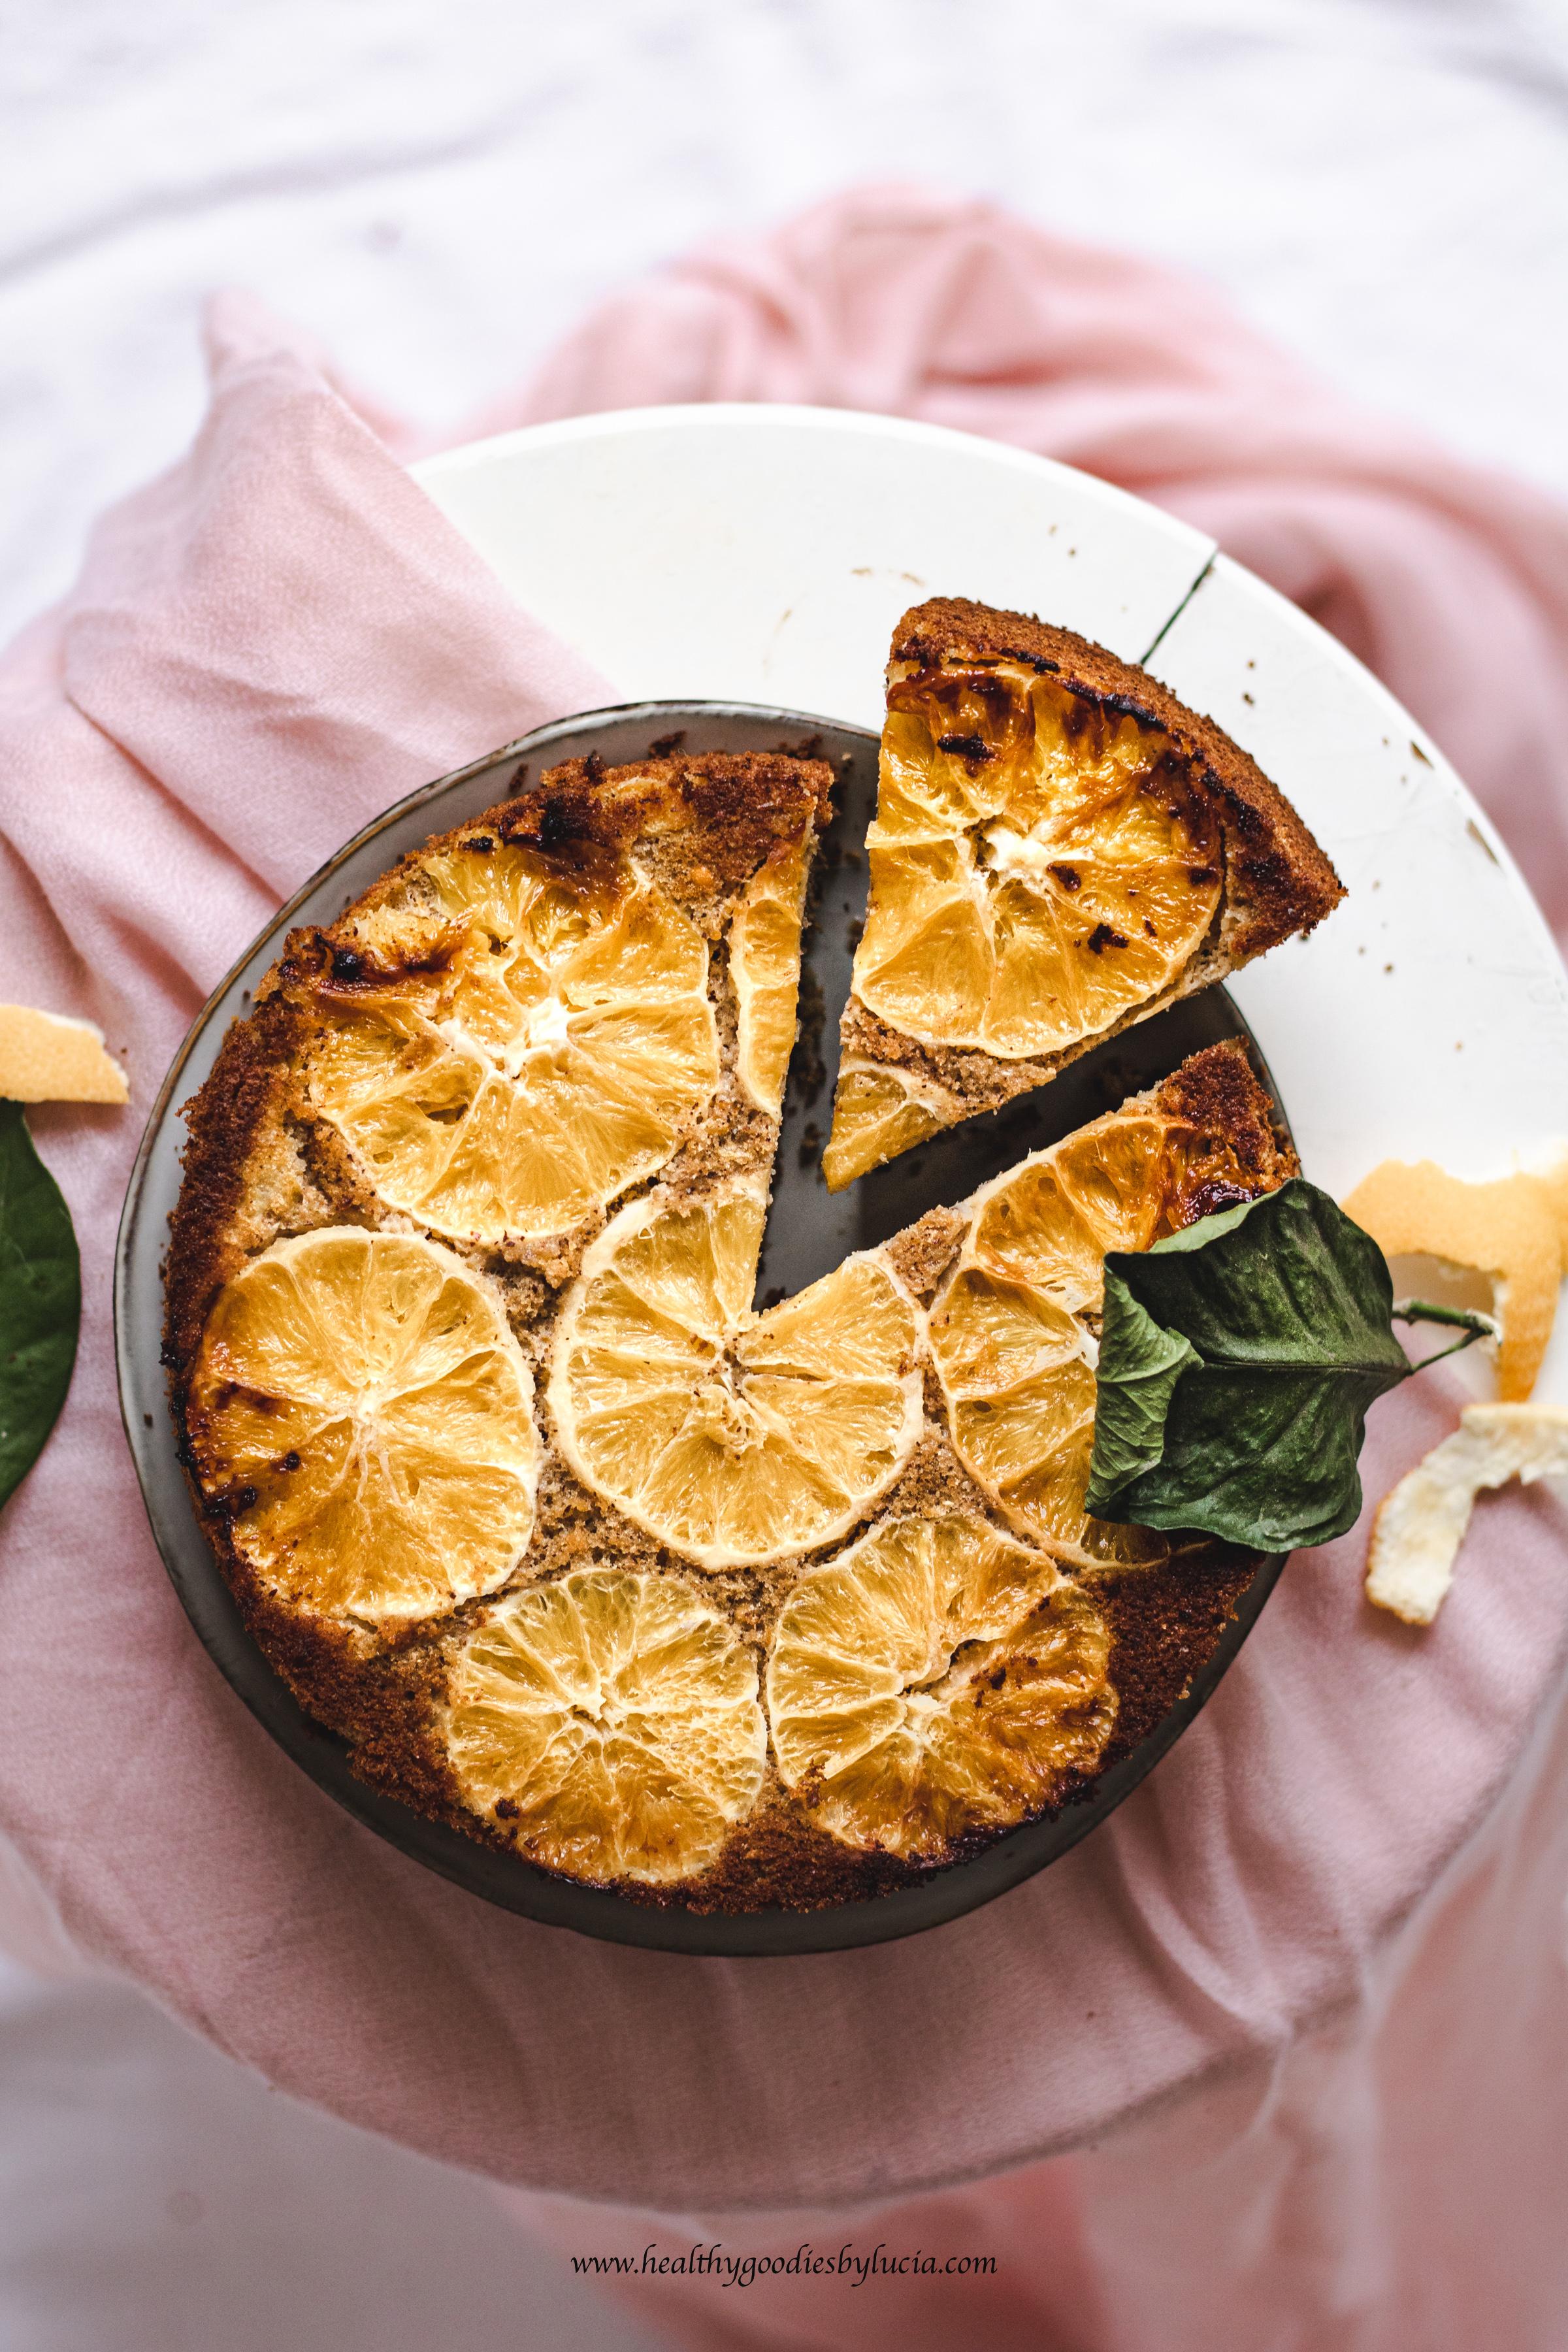 Gluten-free upside-down orange cake | Healthy Goodies by lucia